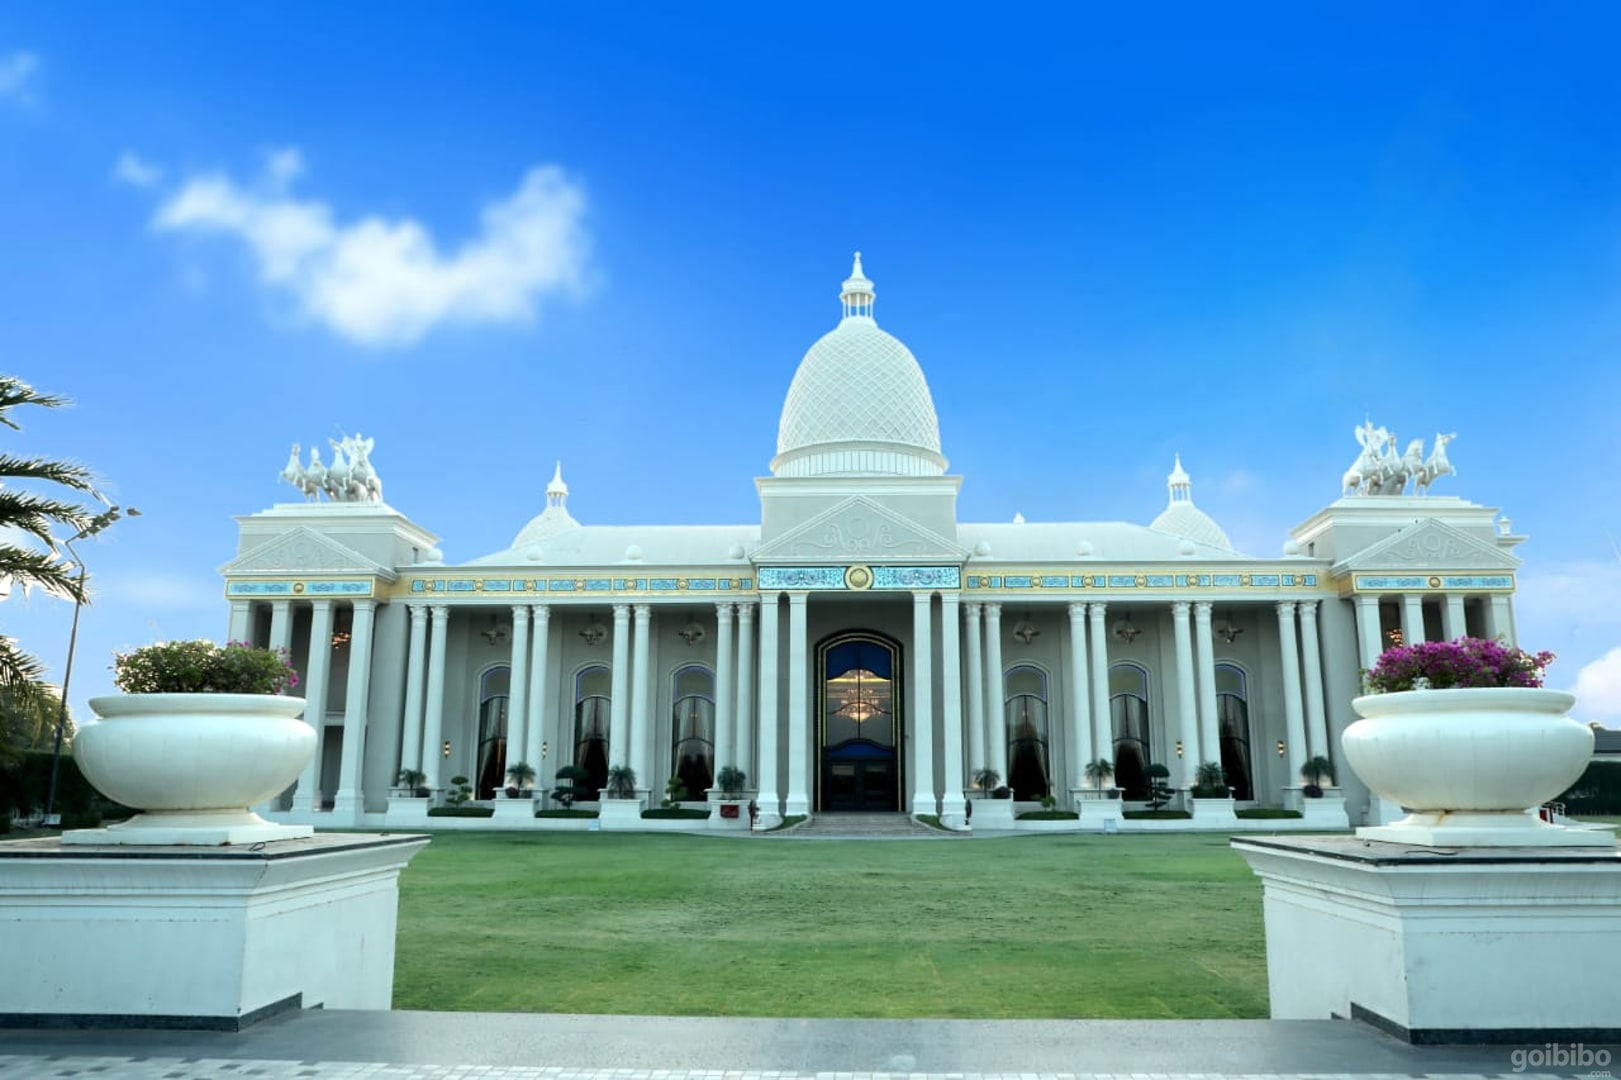 Best Best Luxury Hotel in Indore-The Grand Bhagwati Palace